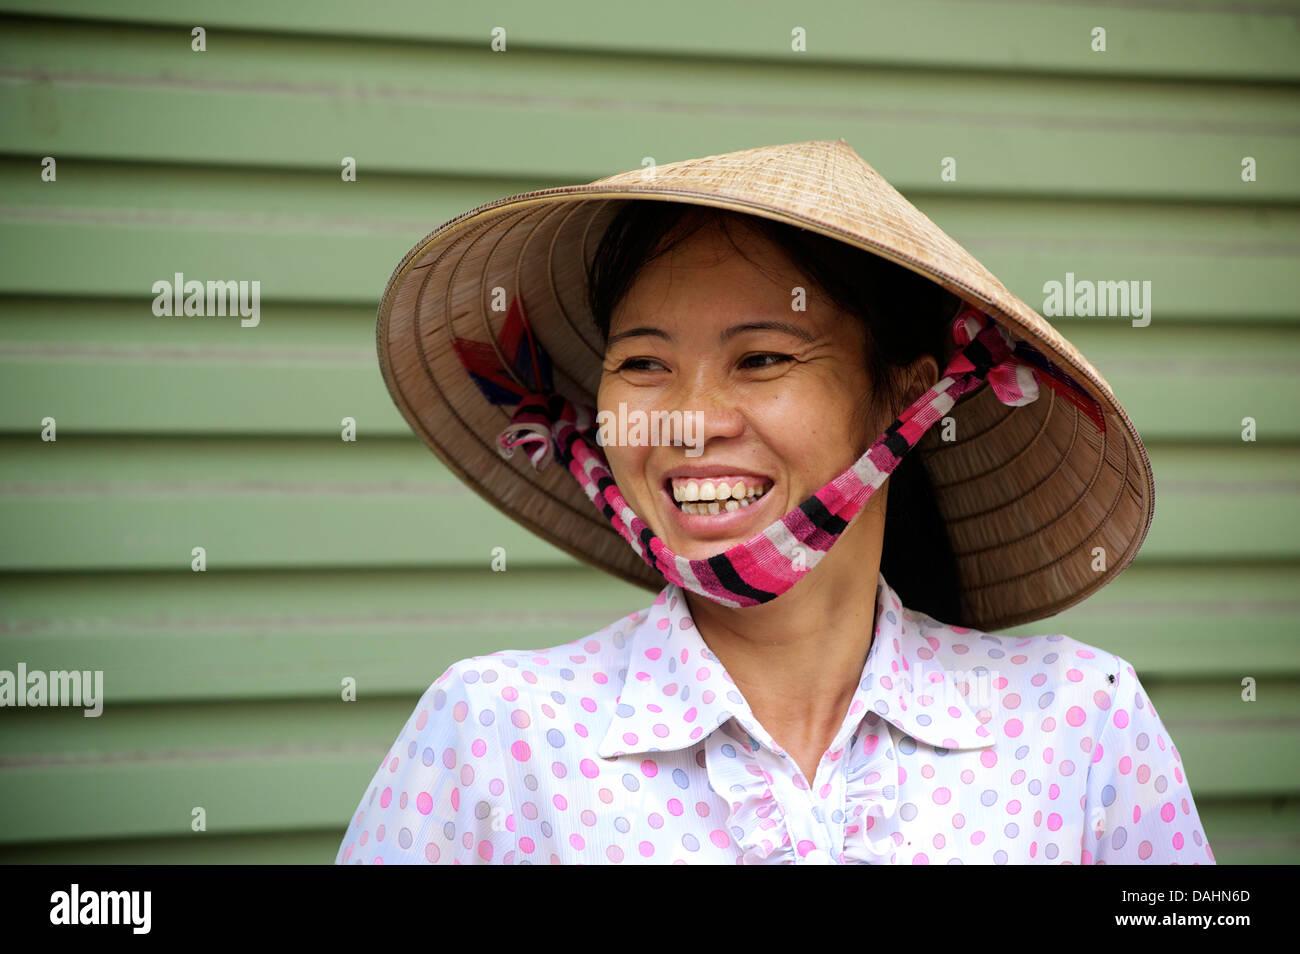 Portrait of a snack vendor in distinctive hat, Hanoi. MODEL RELEASED - Stock Image